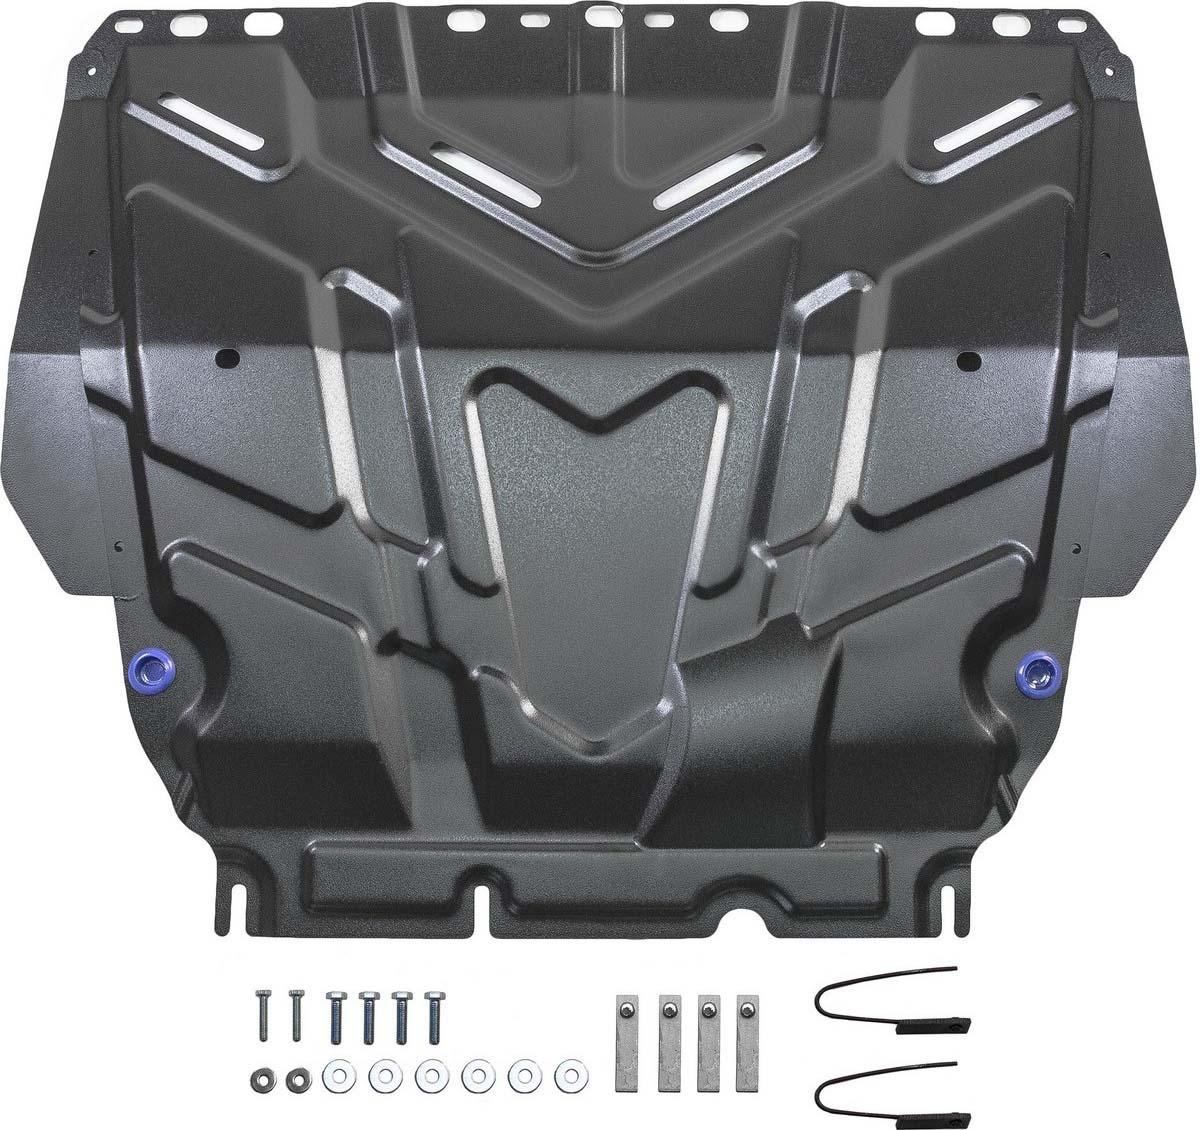 Защита картера и КПП Rival для Ford C-Max I 2003-2010/Focus II, III 2005-2011 2011-2015 2015-н.в./Grand C-Max II 2010-2015/Kuga I 2008-2013, сталь 2 мм, с крепежом. 111.1850.1 surkov v texts 1997 2010